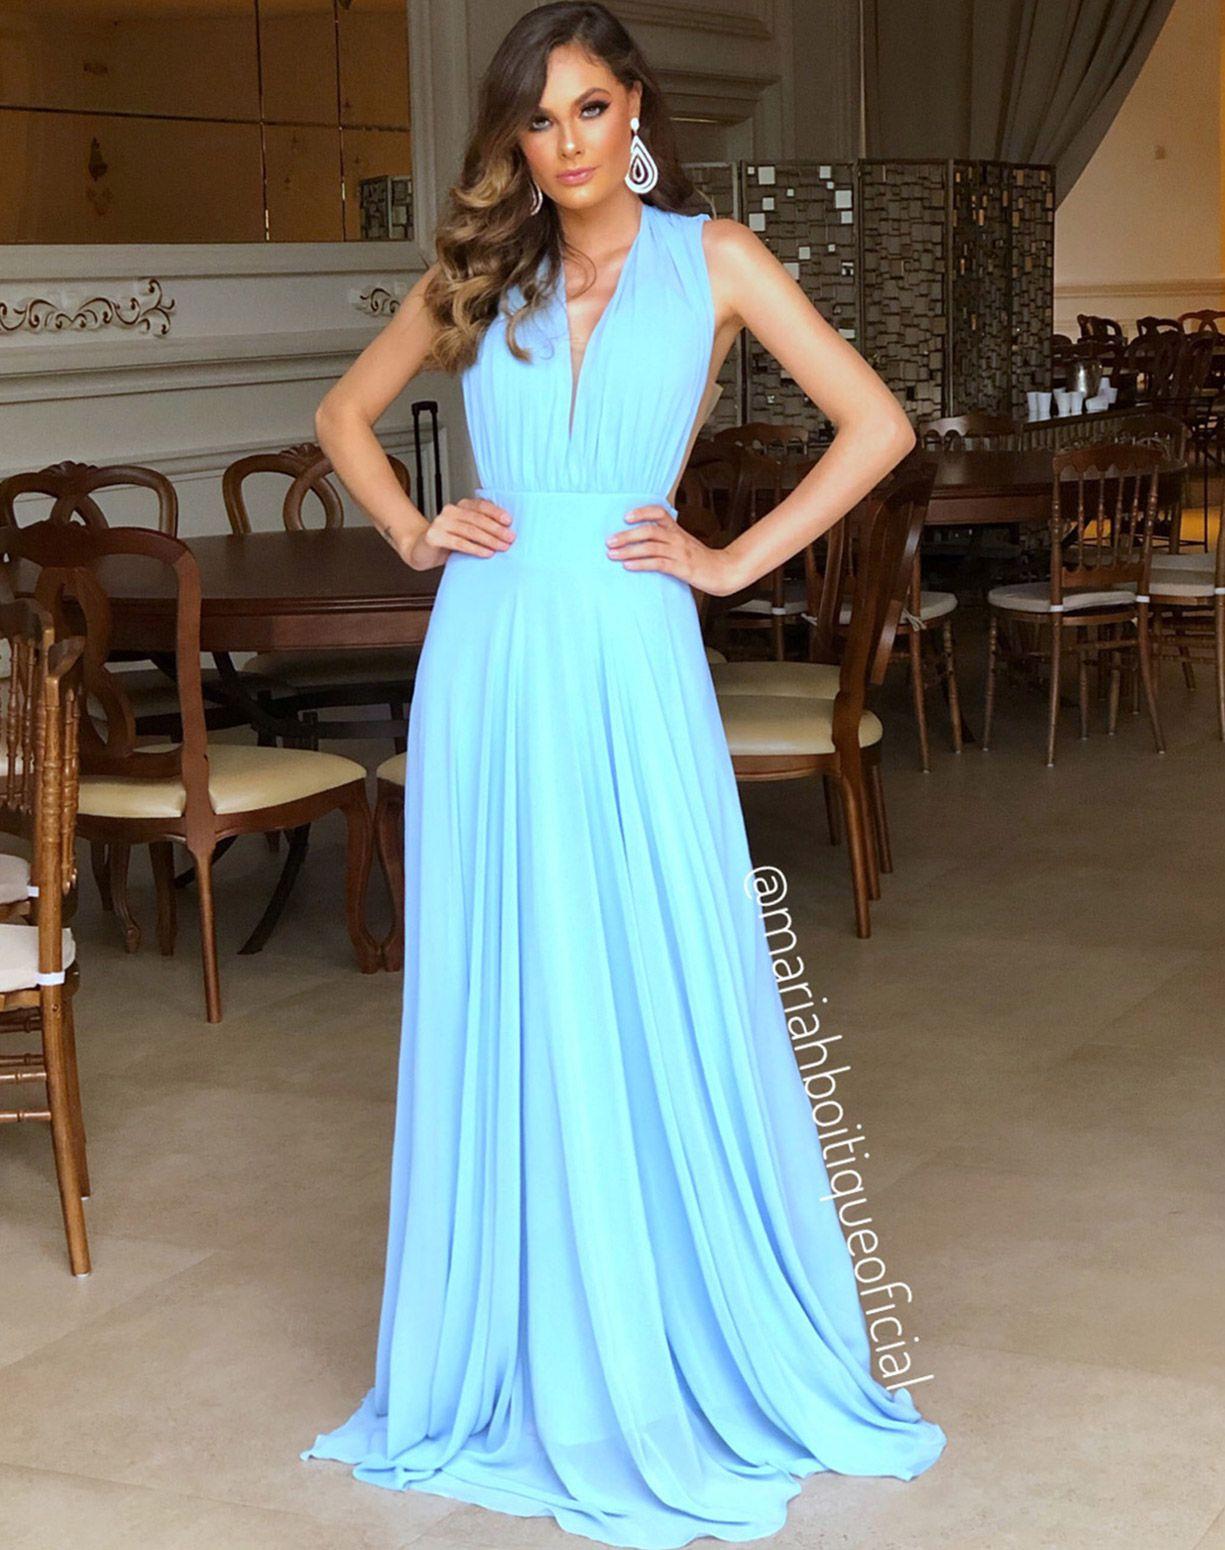 Vestido Com Transparência Azul Serenity